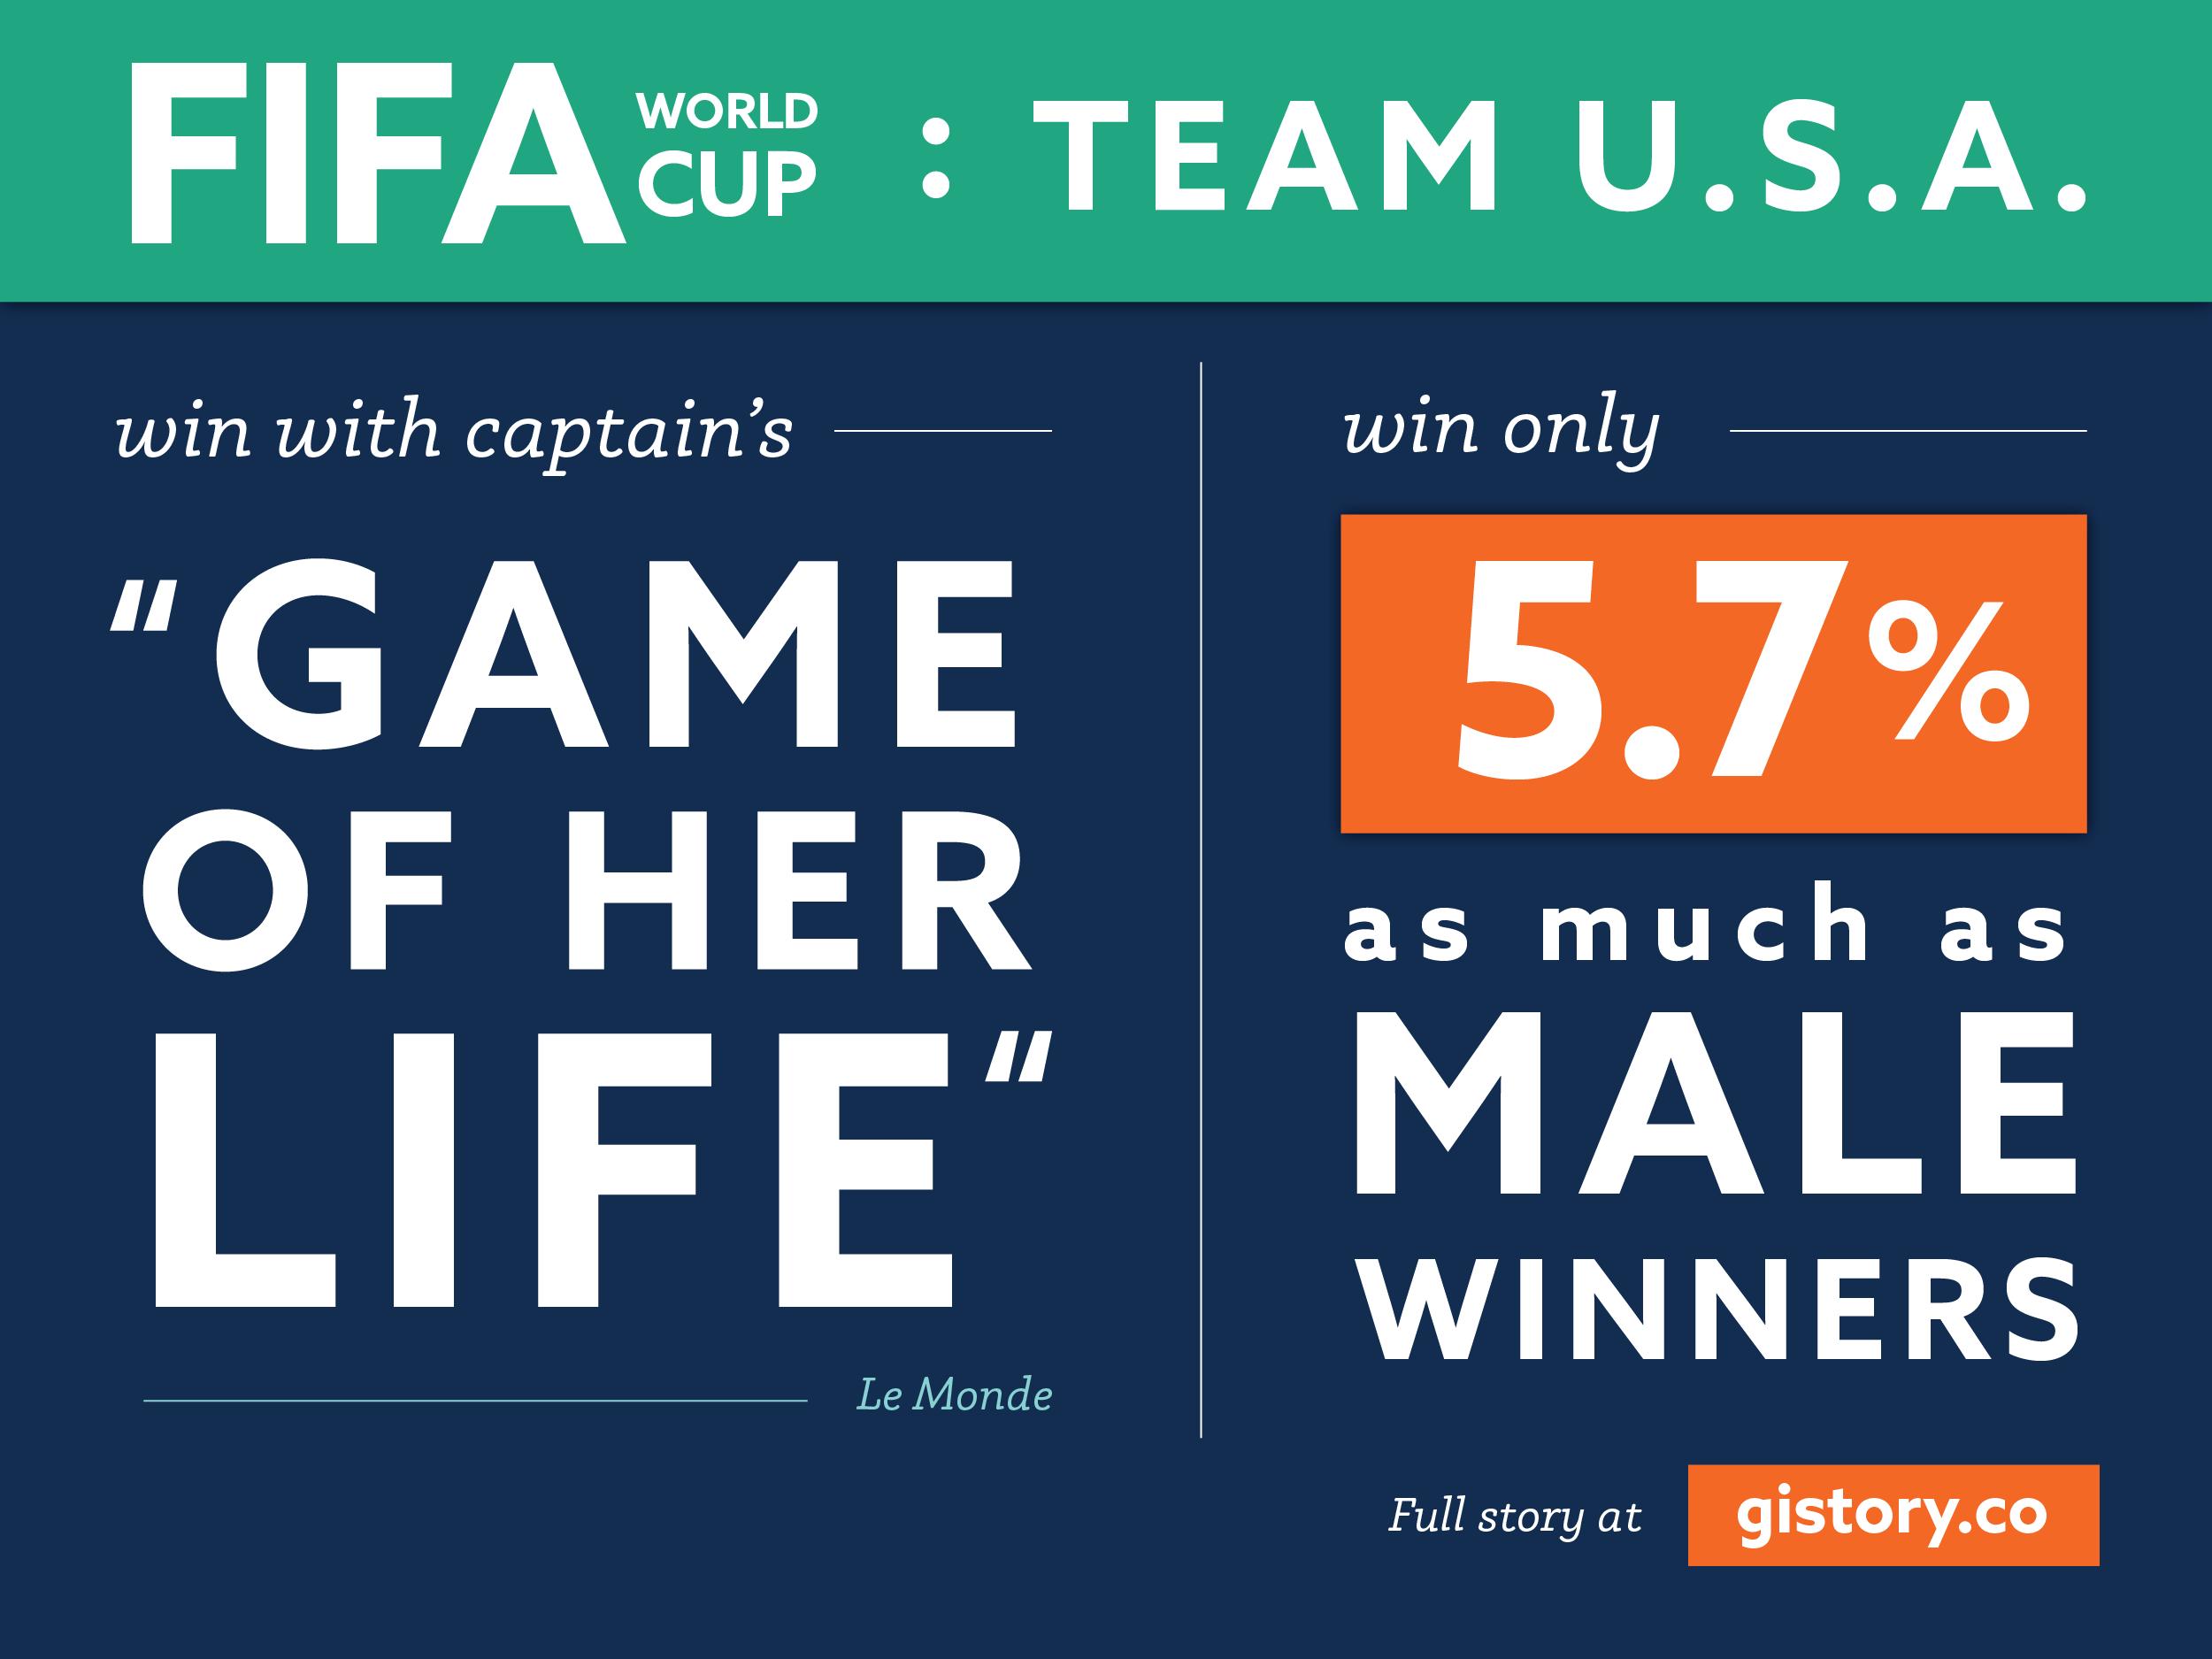 USA_WinsWorldCup_Facebook.png